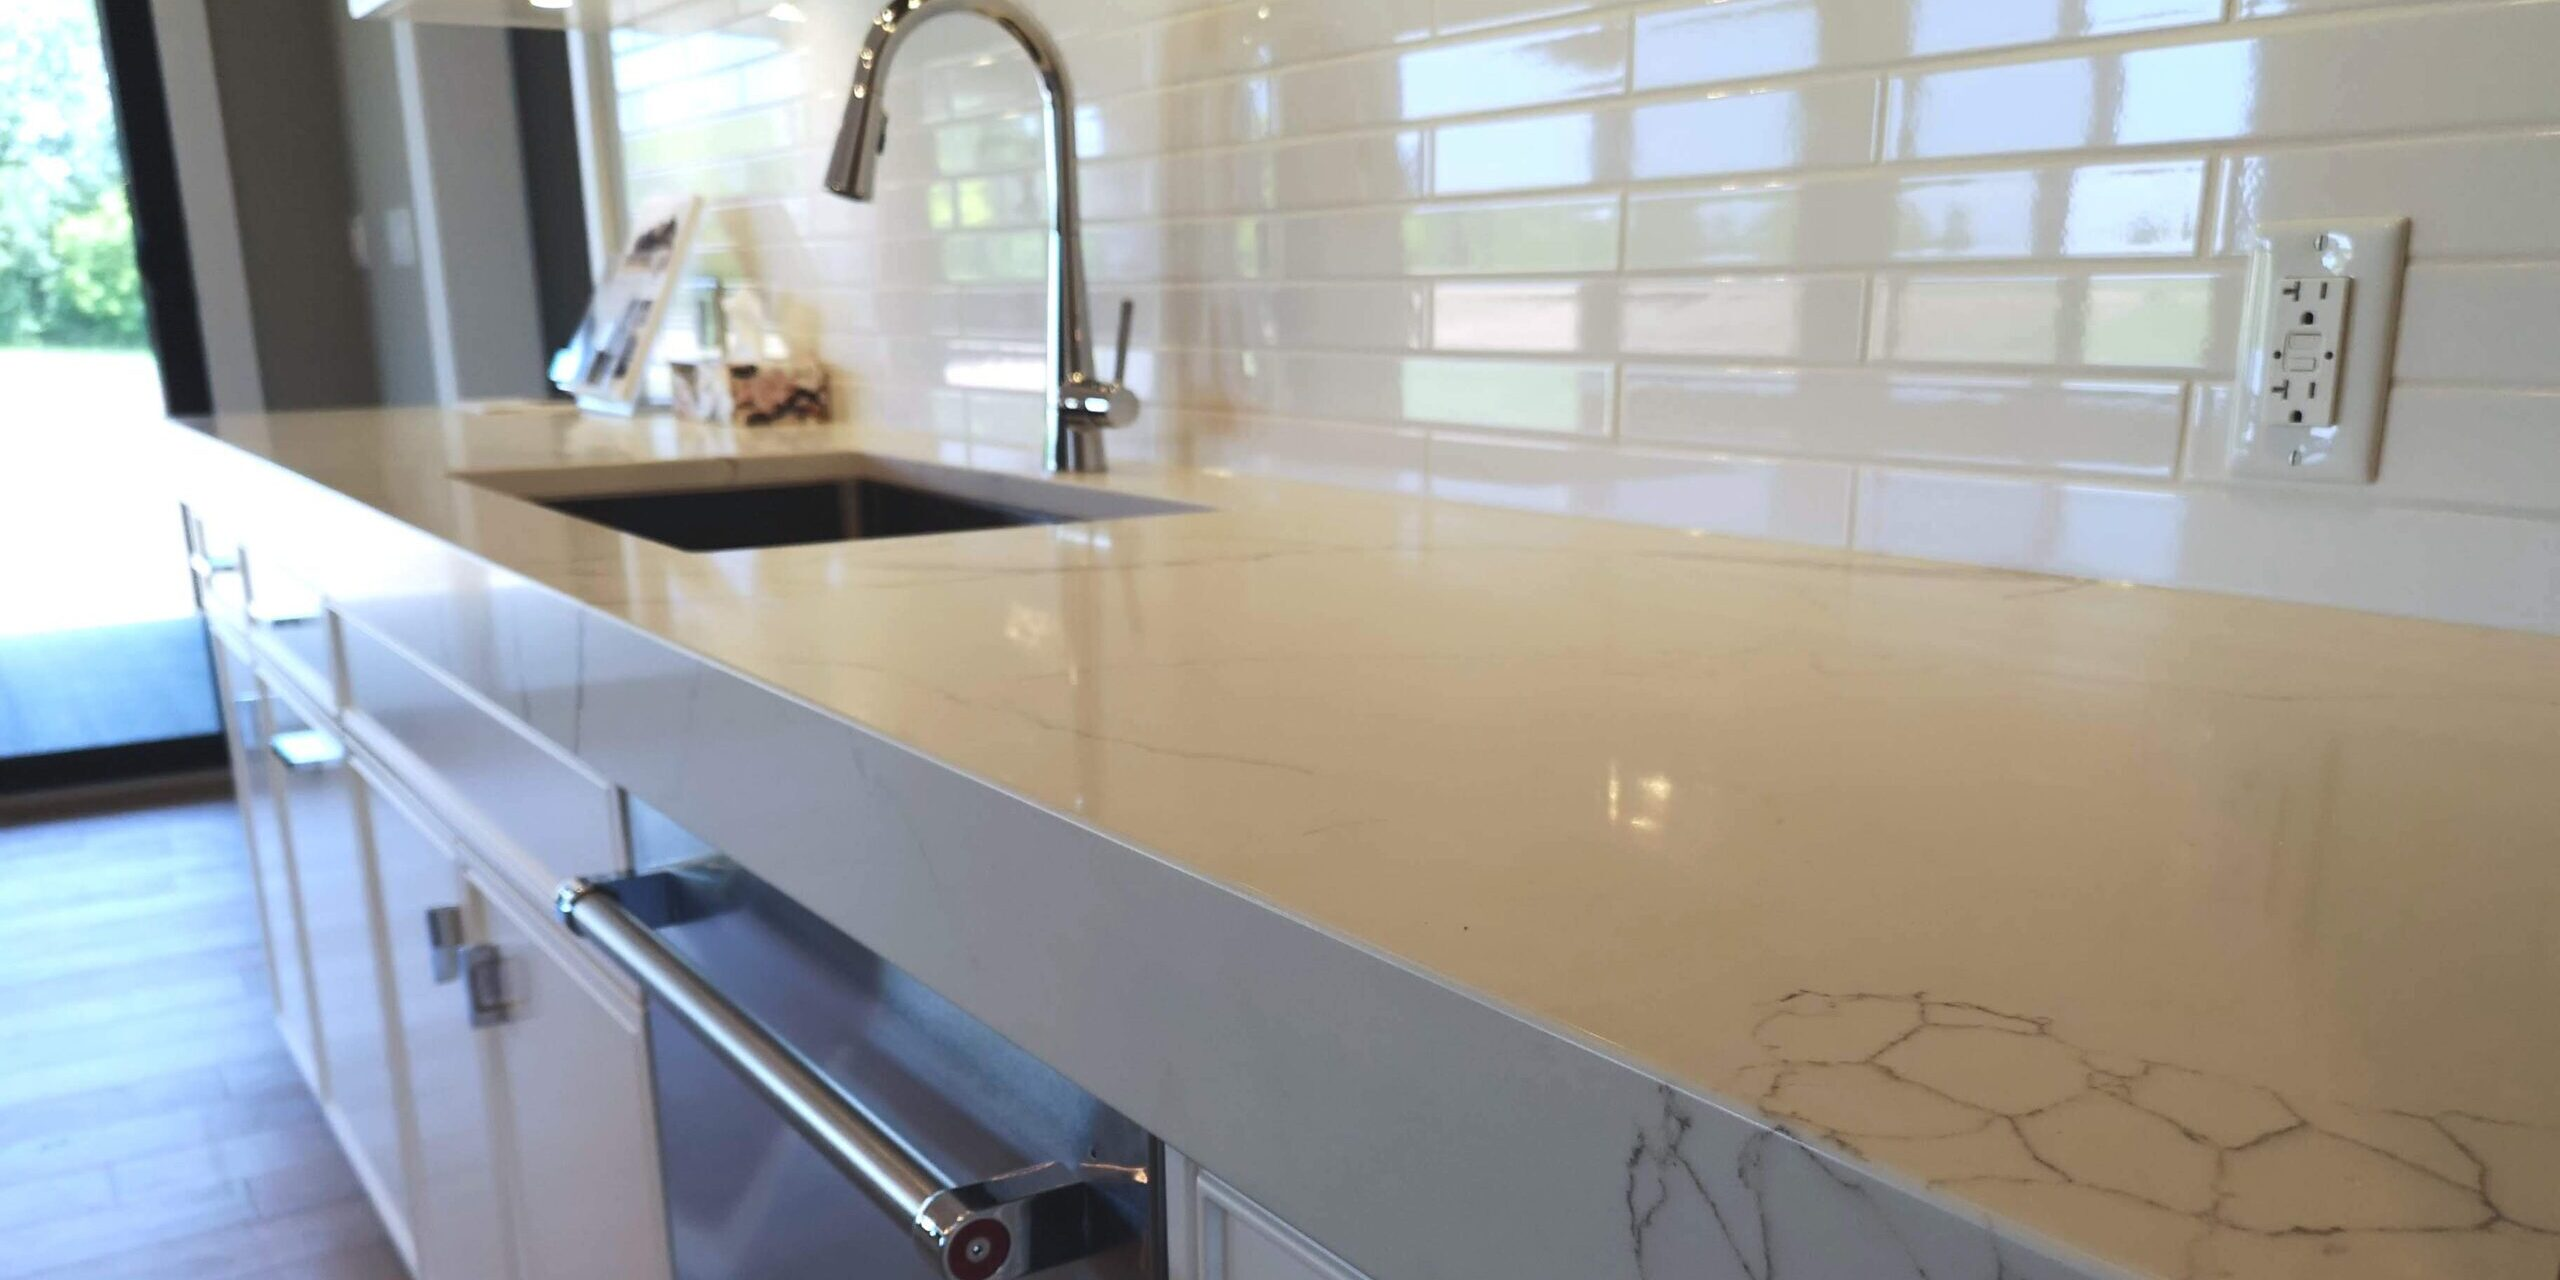 popular countertop and backsplash